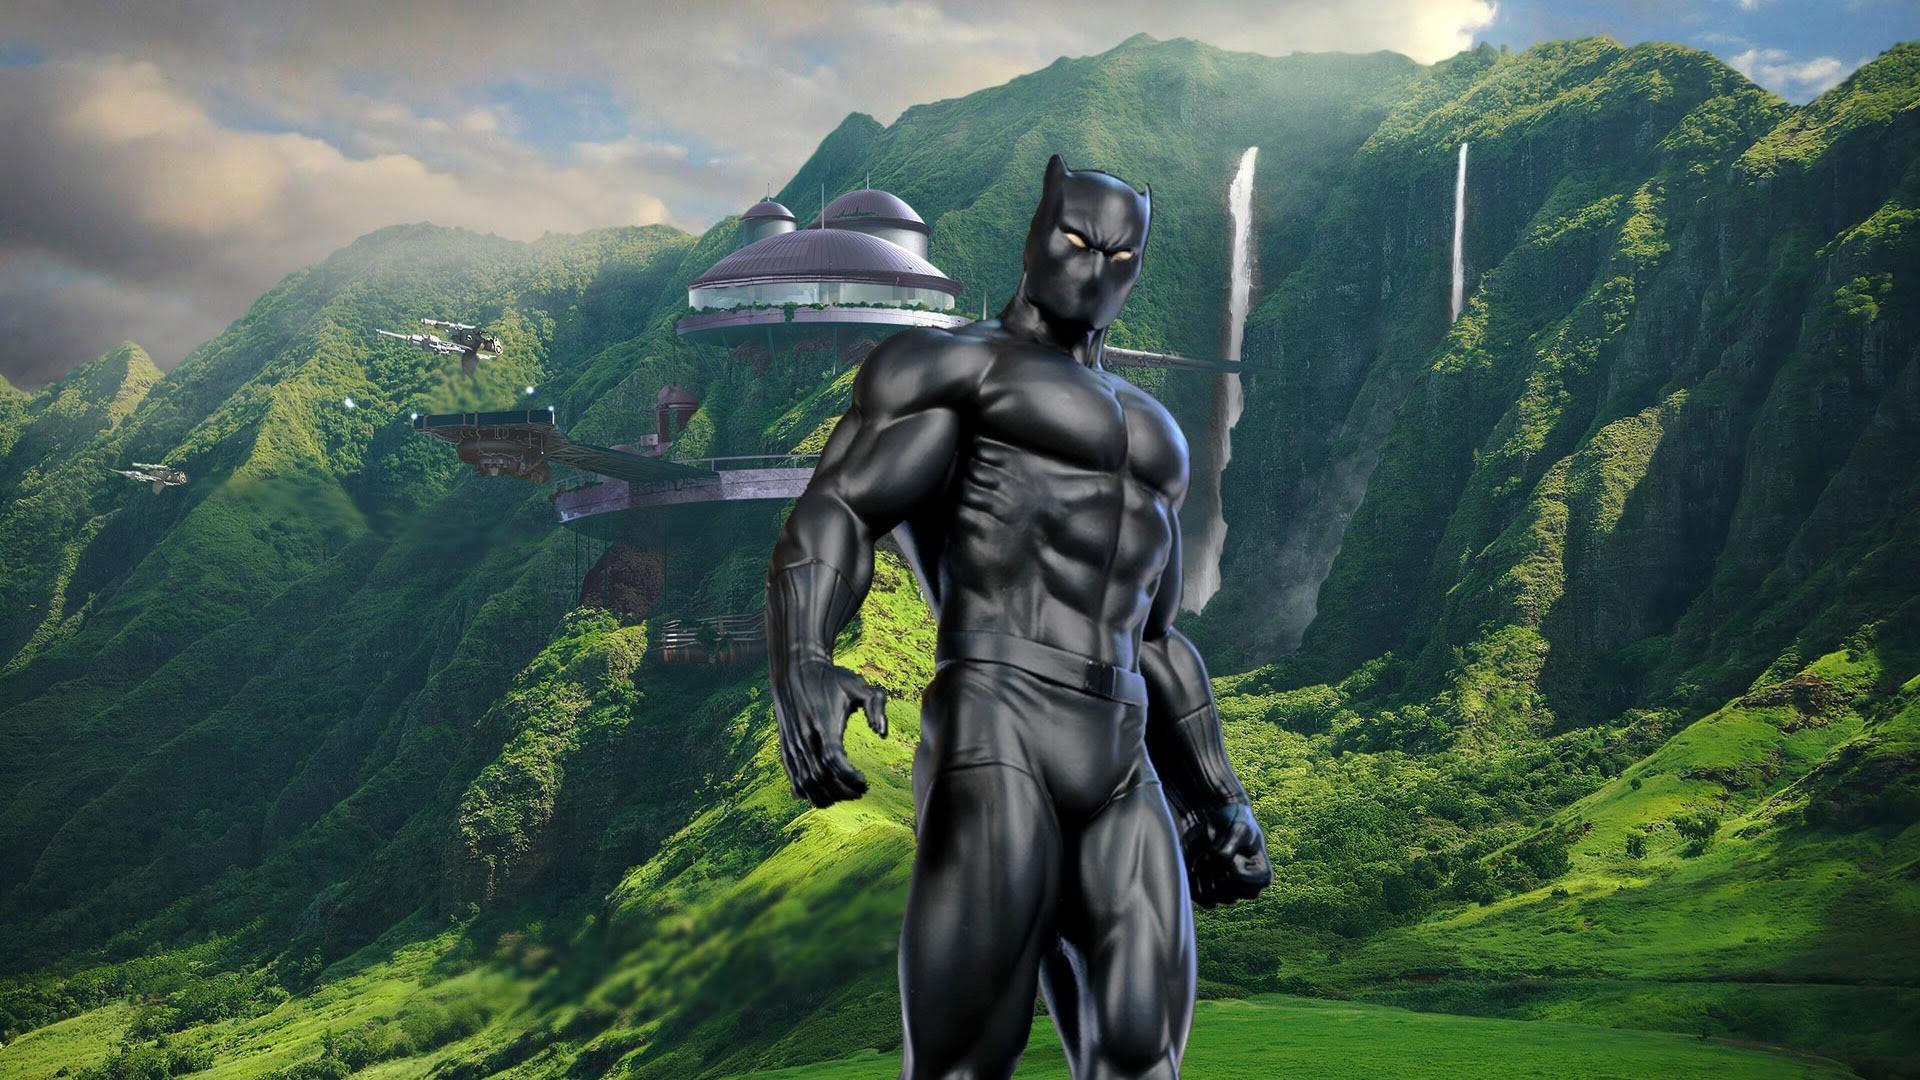 Download 2017 Black Panther Desktop Background HD Wallpaper. Search .